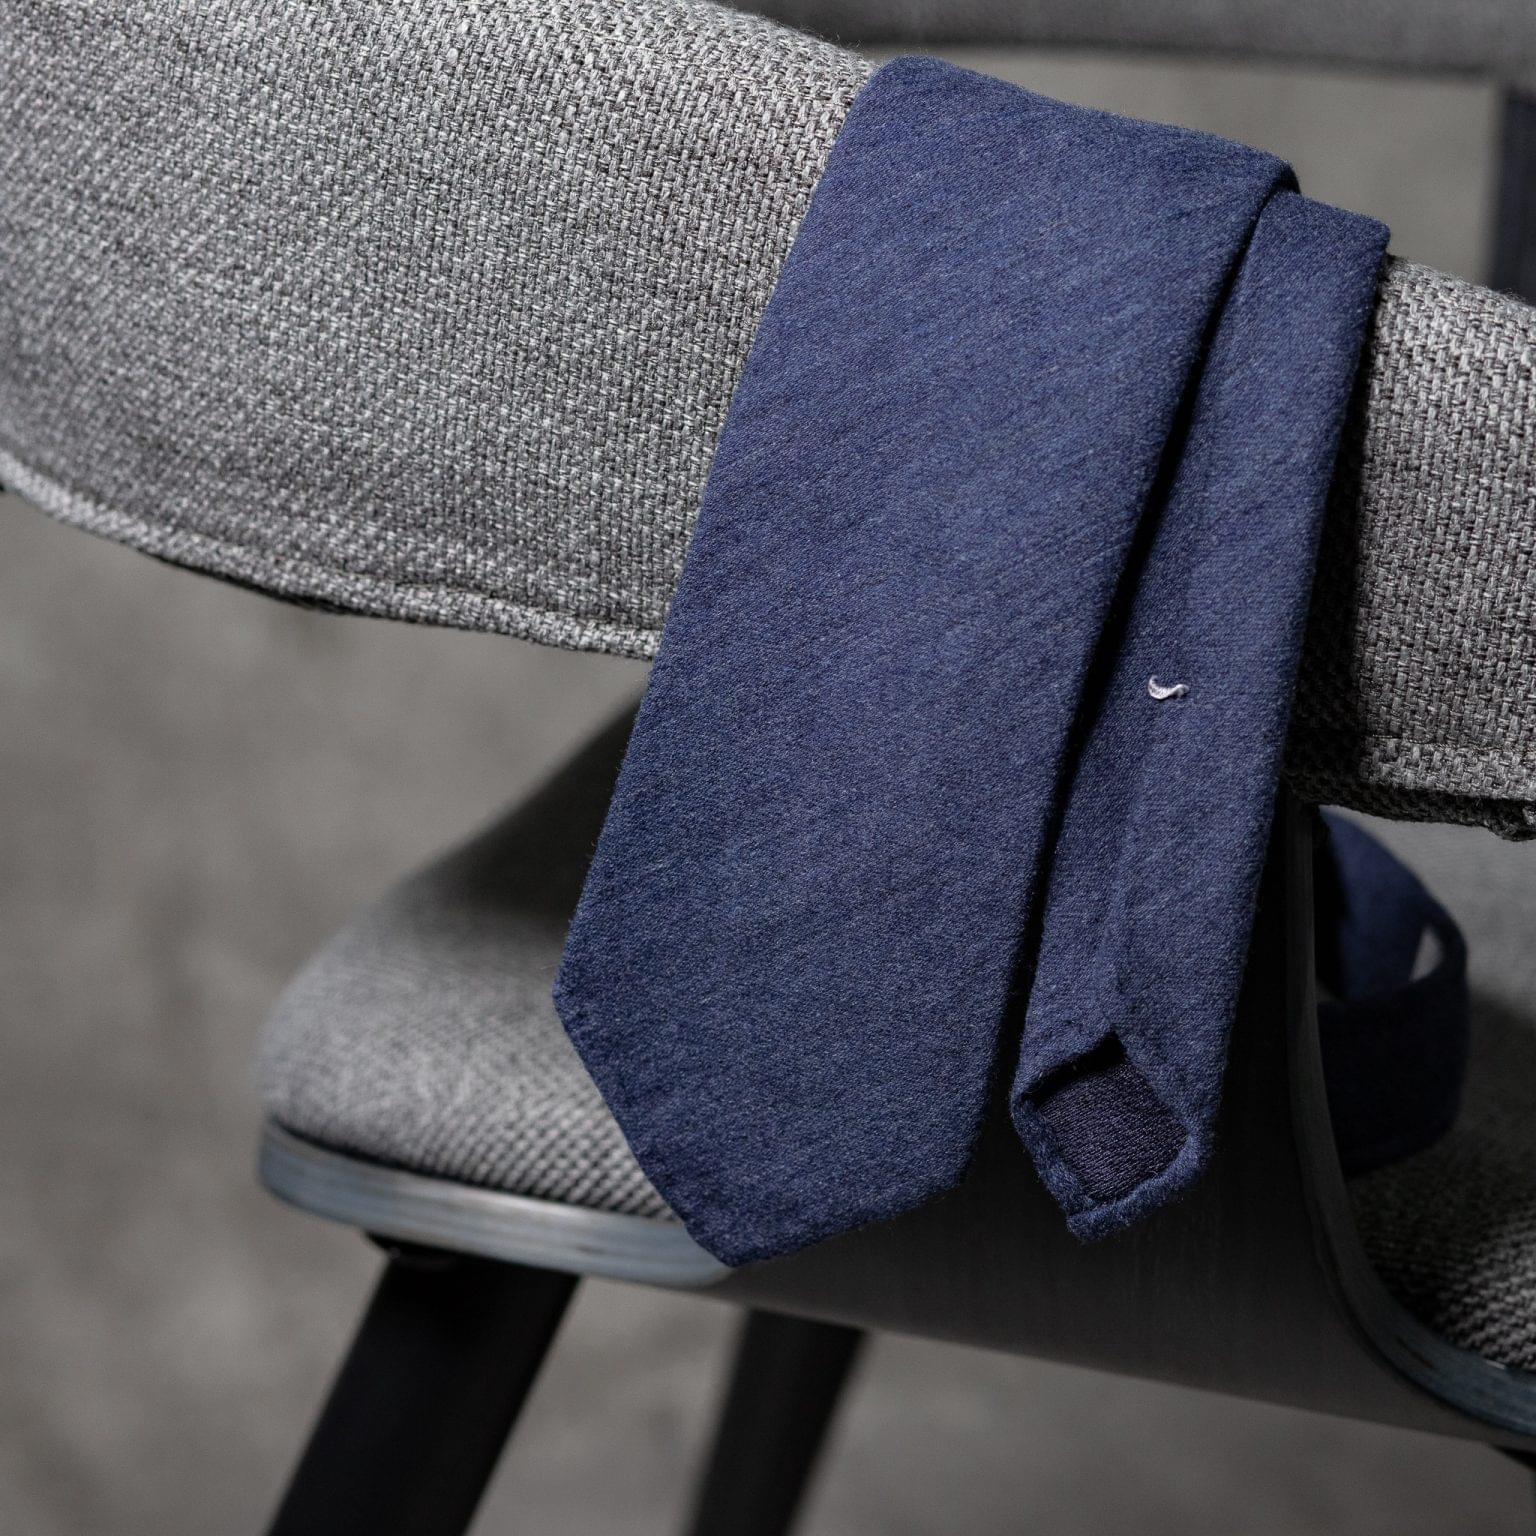 WOOL-LANA-0474-Tie-Initials-Corbata-Iniciales-The-Seelk-2